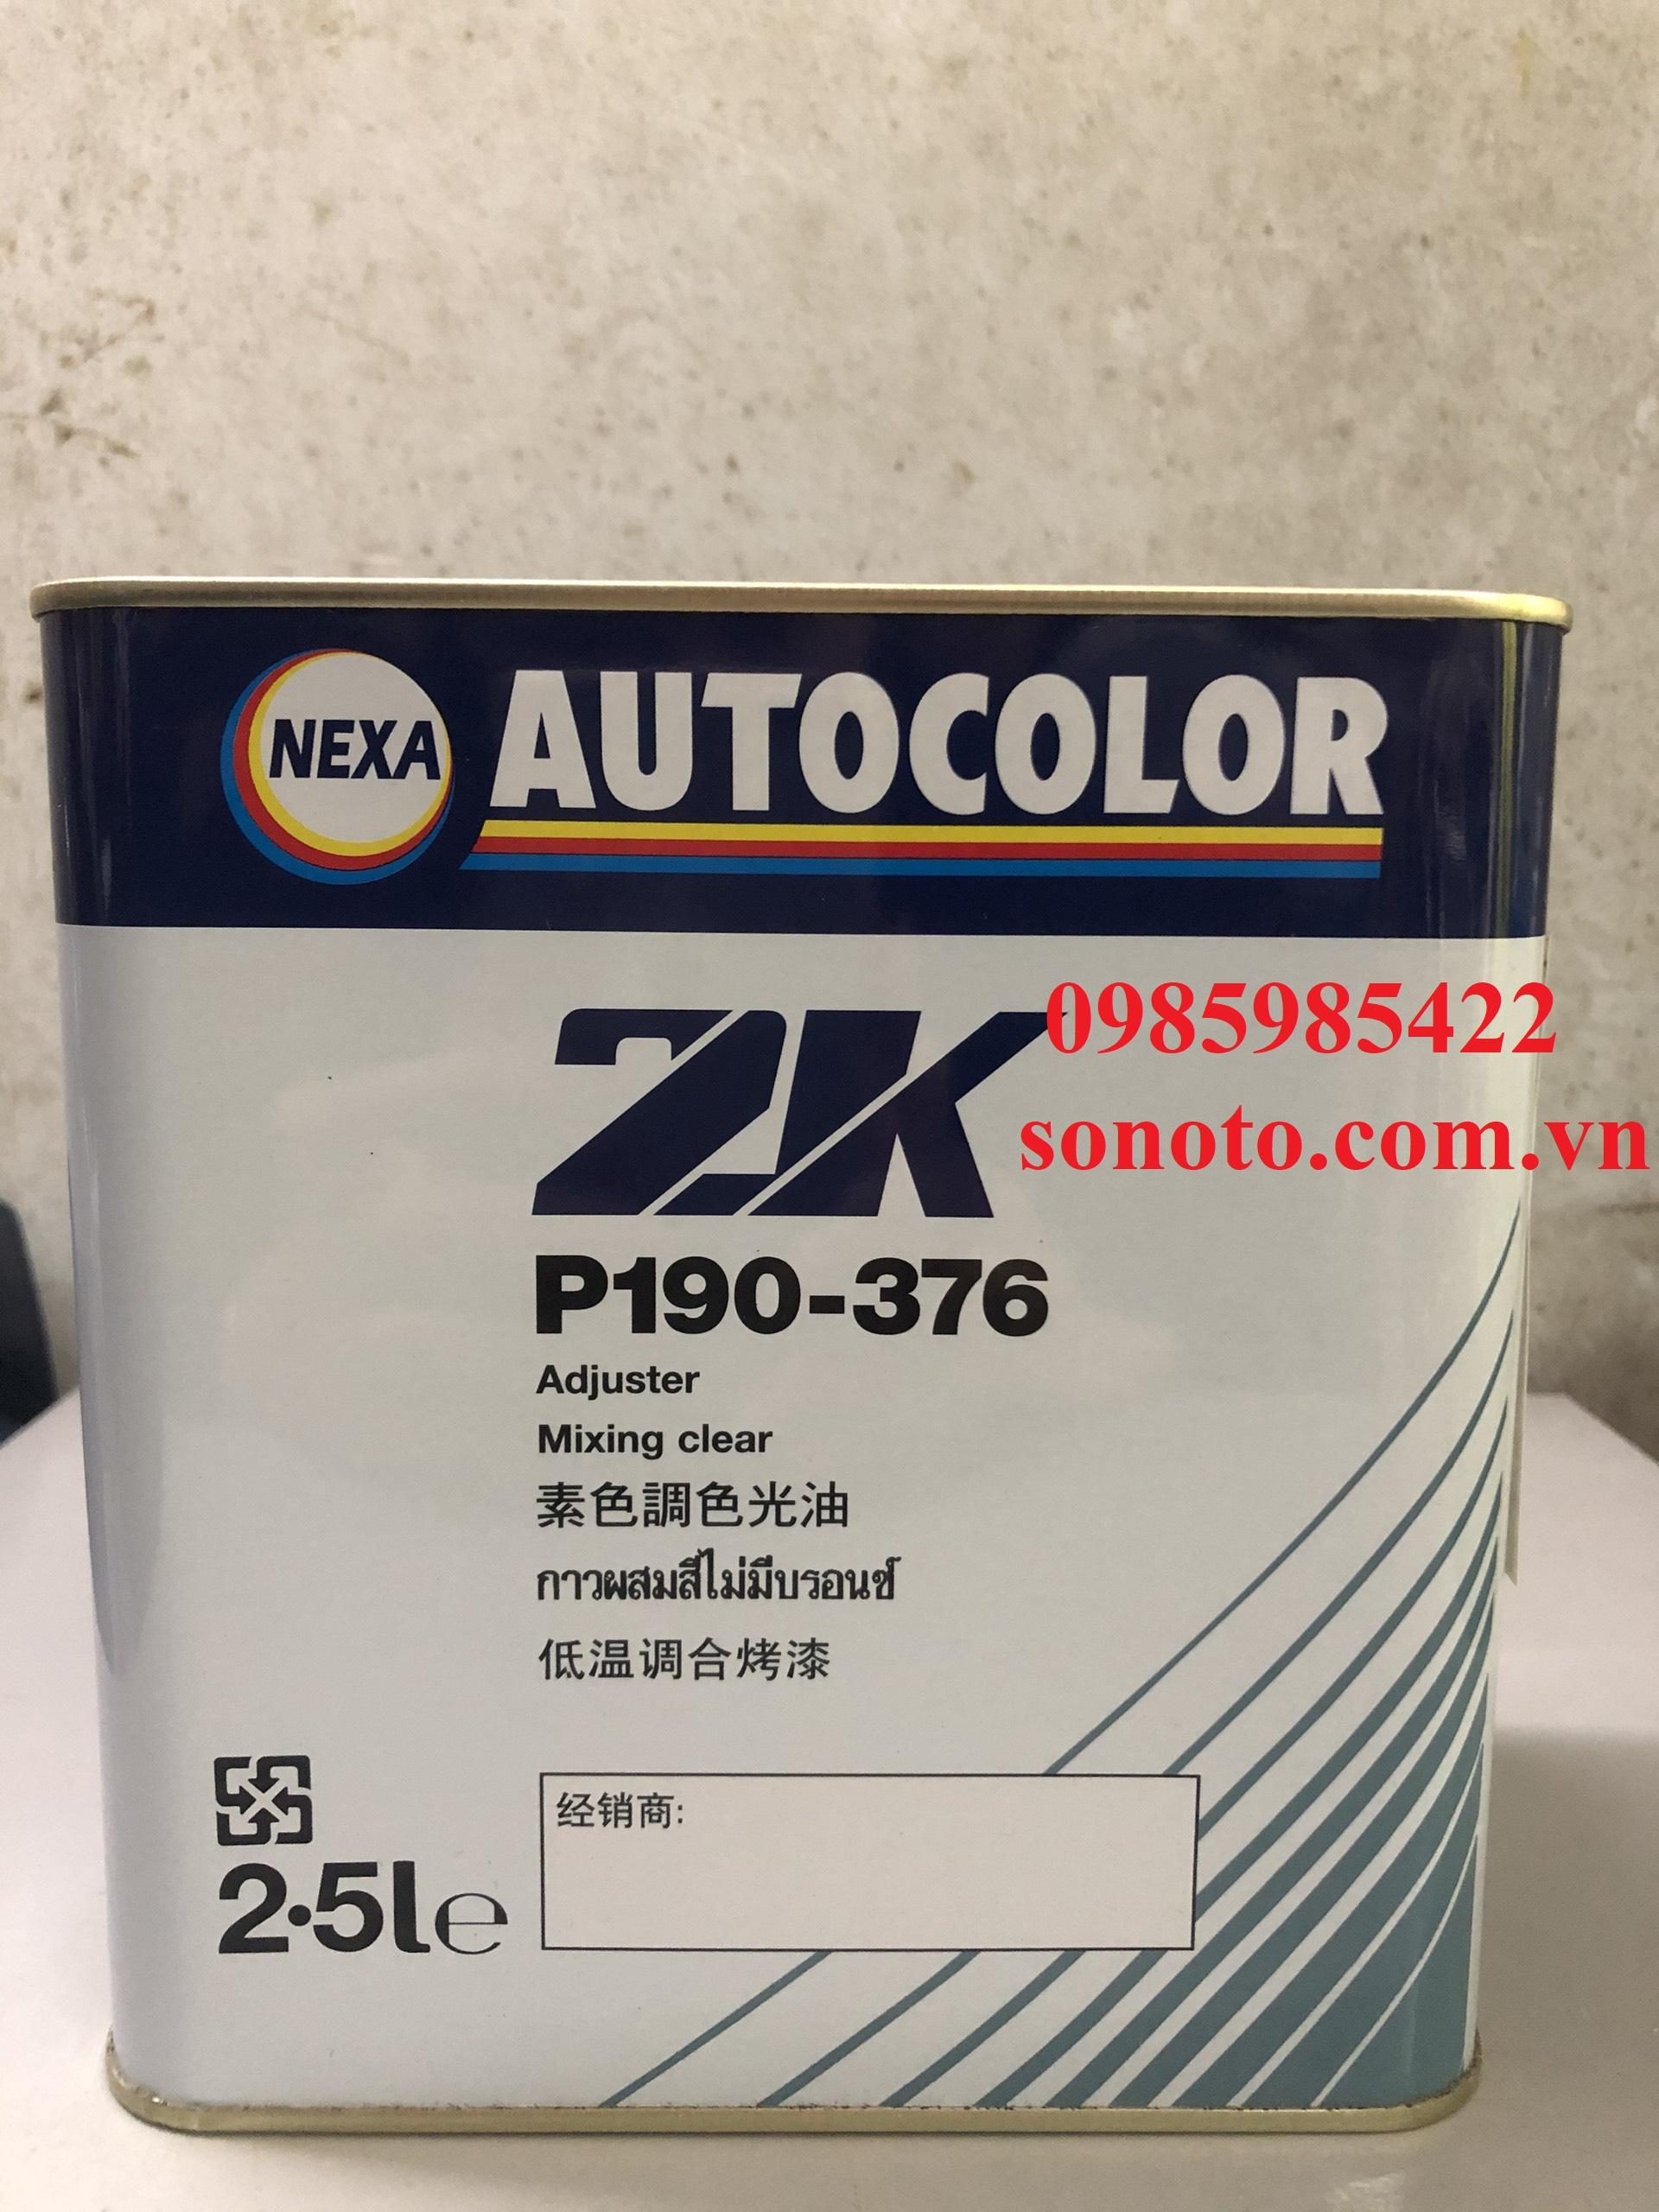 p190-376-phu-gia-bai-do-cho-mau-solid-tu-bong-2k-hang-nexa-autocolor-lon-2-5l